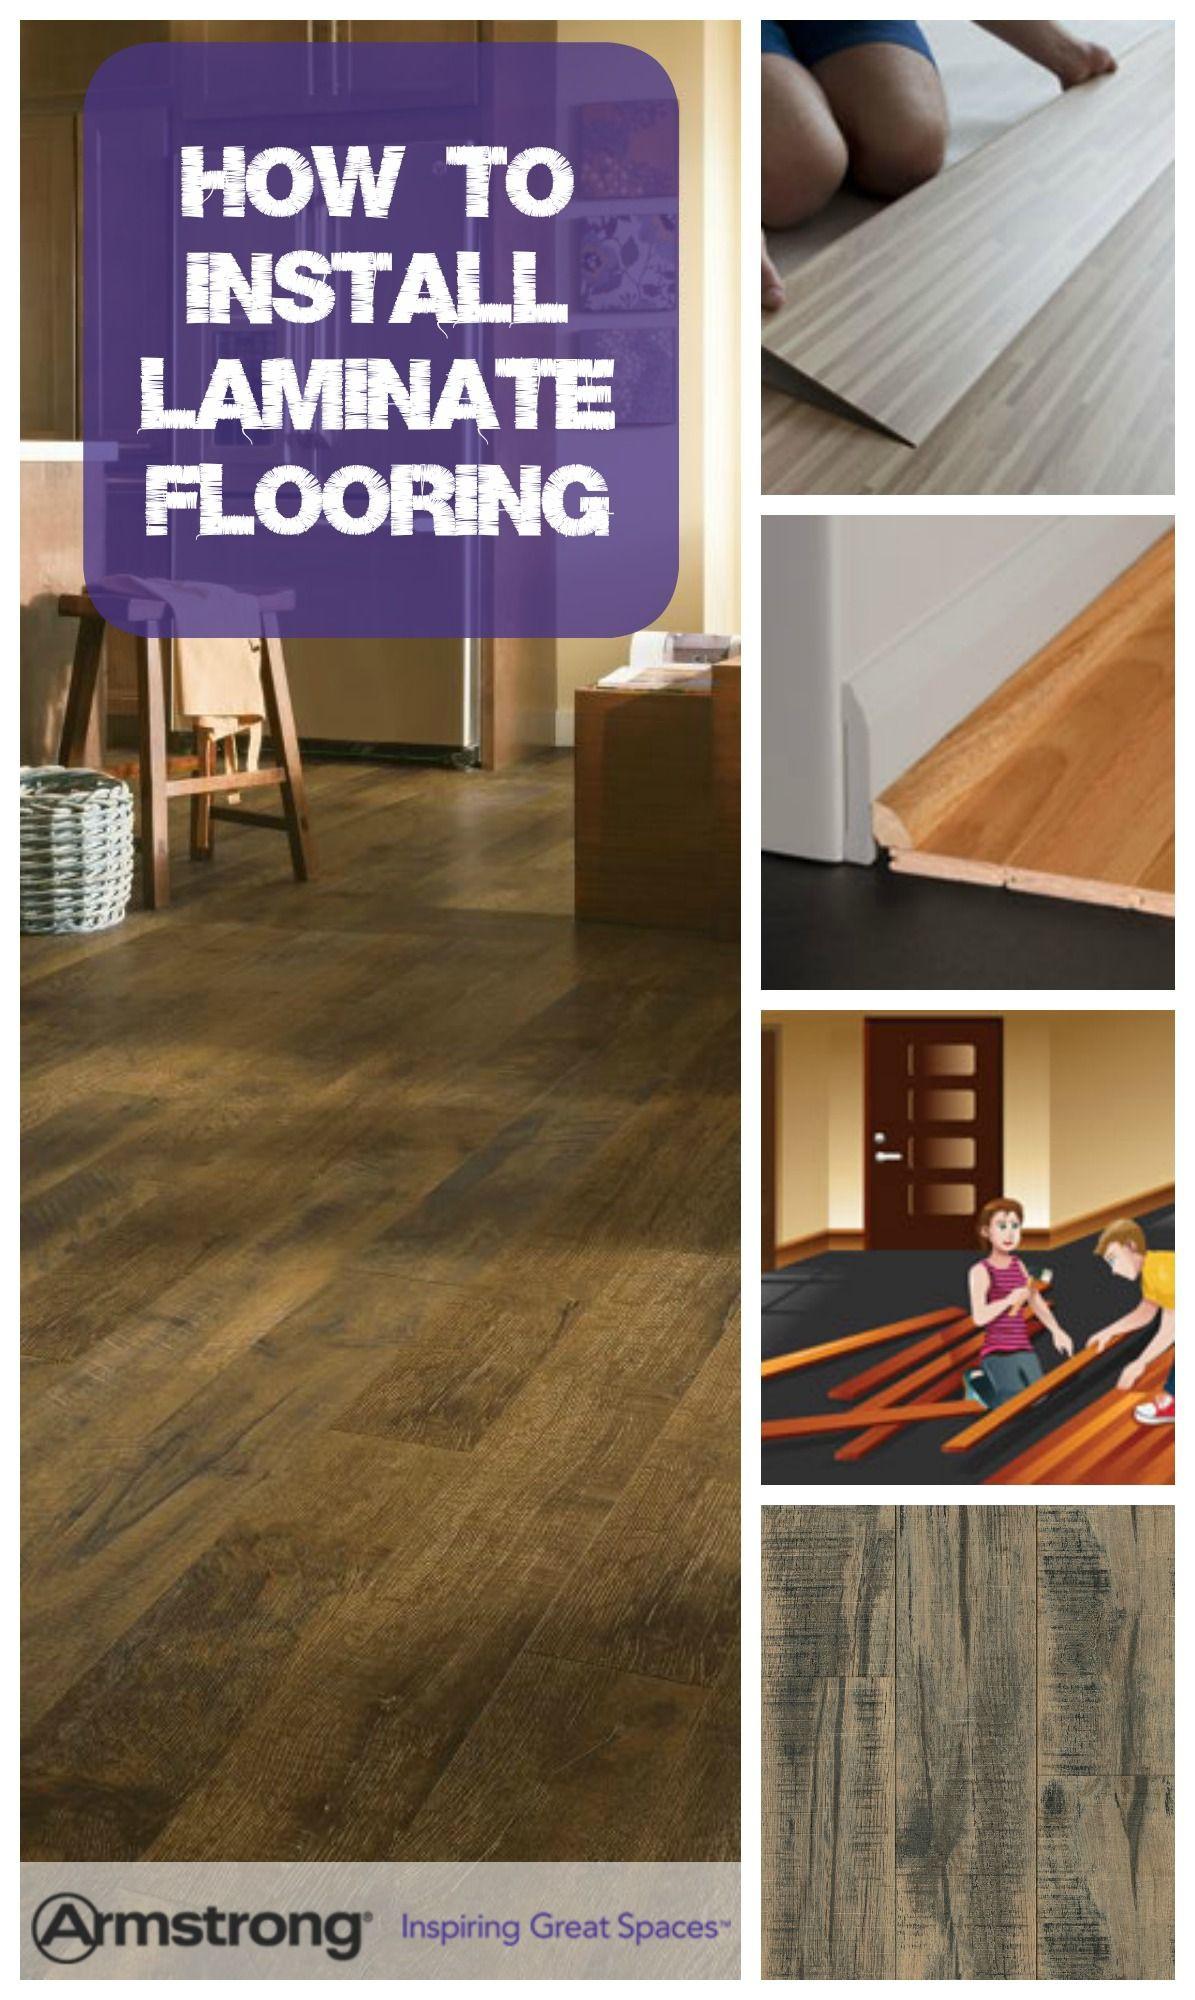 installing oak hardwood floors of how do you install laminate flooring weve got all you need to know in how do you install laminate flooring weve got all you need to know